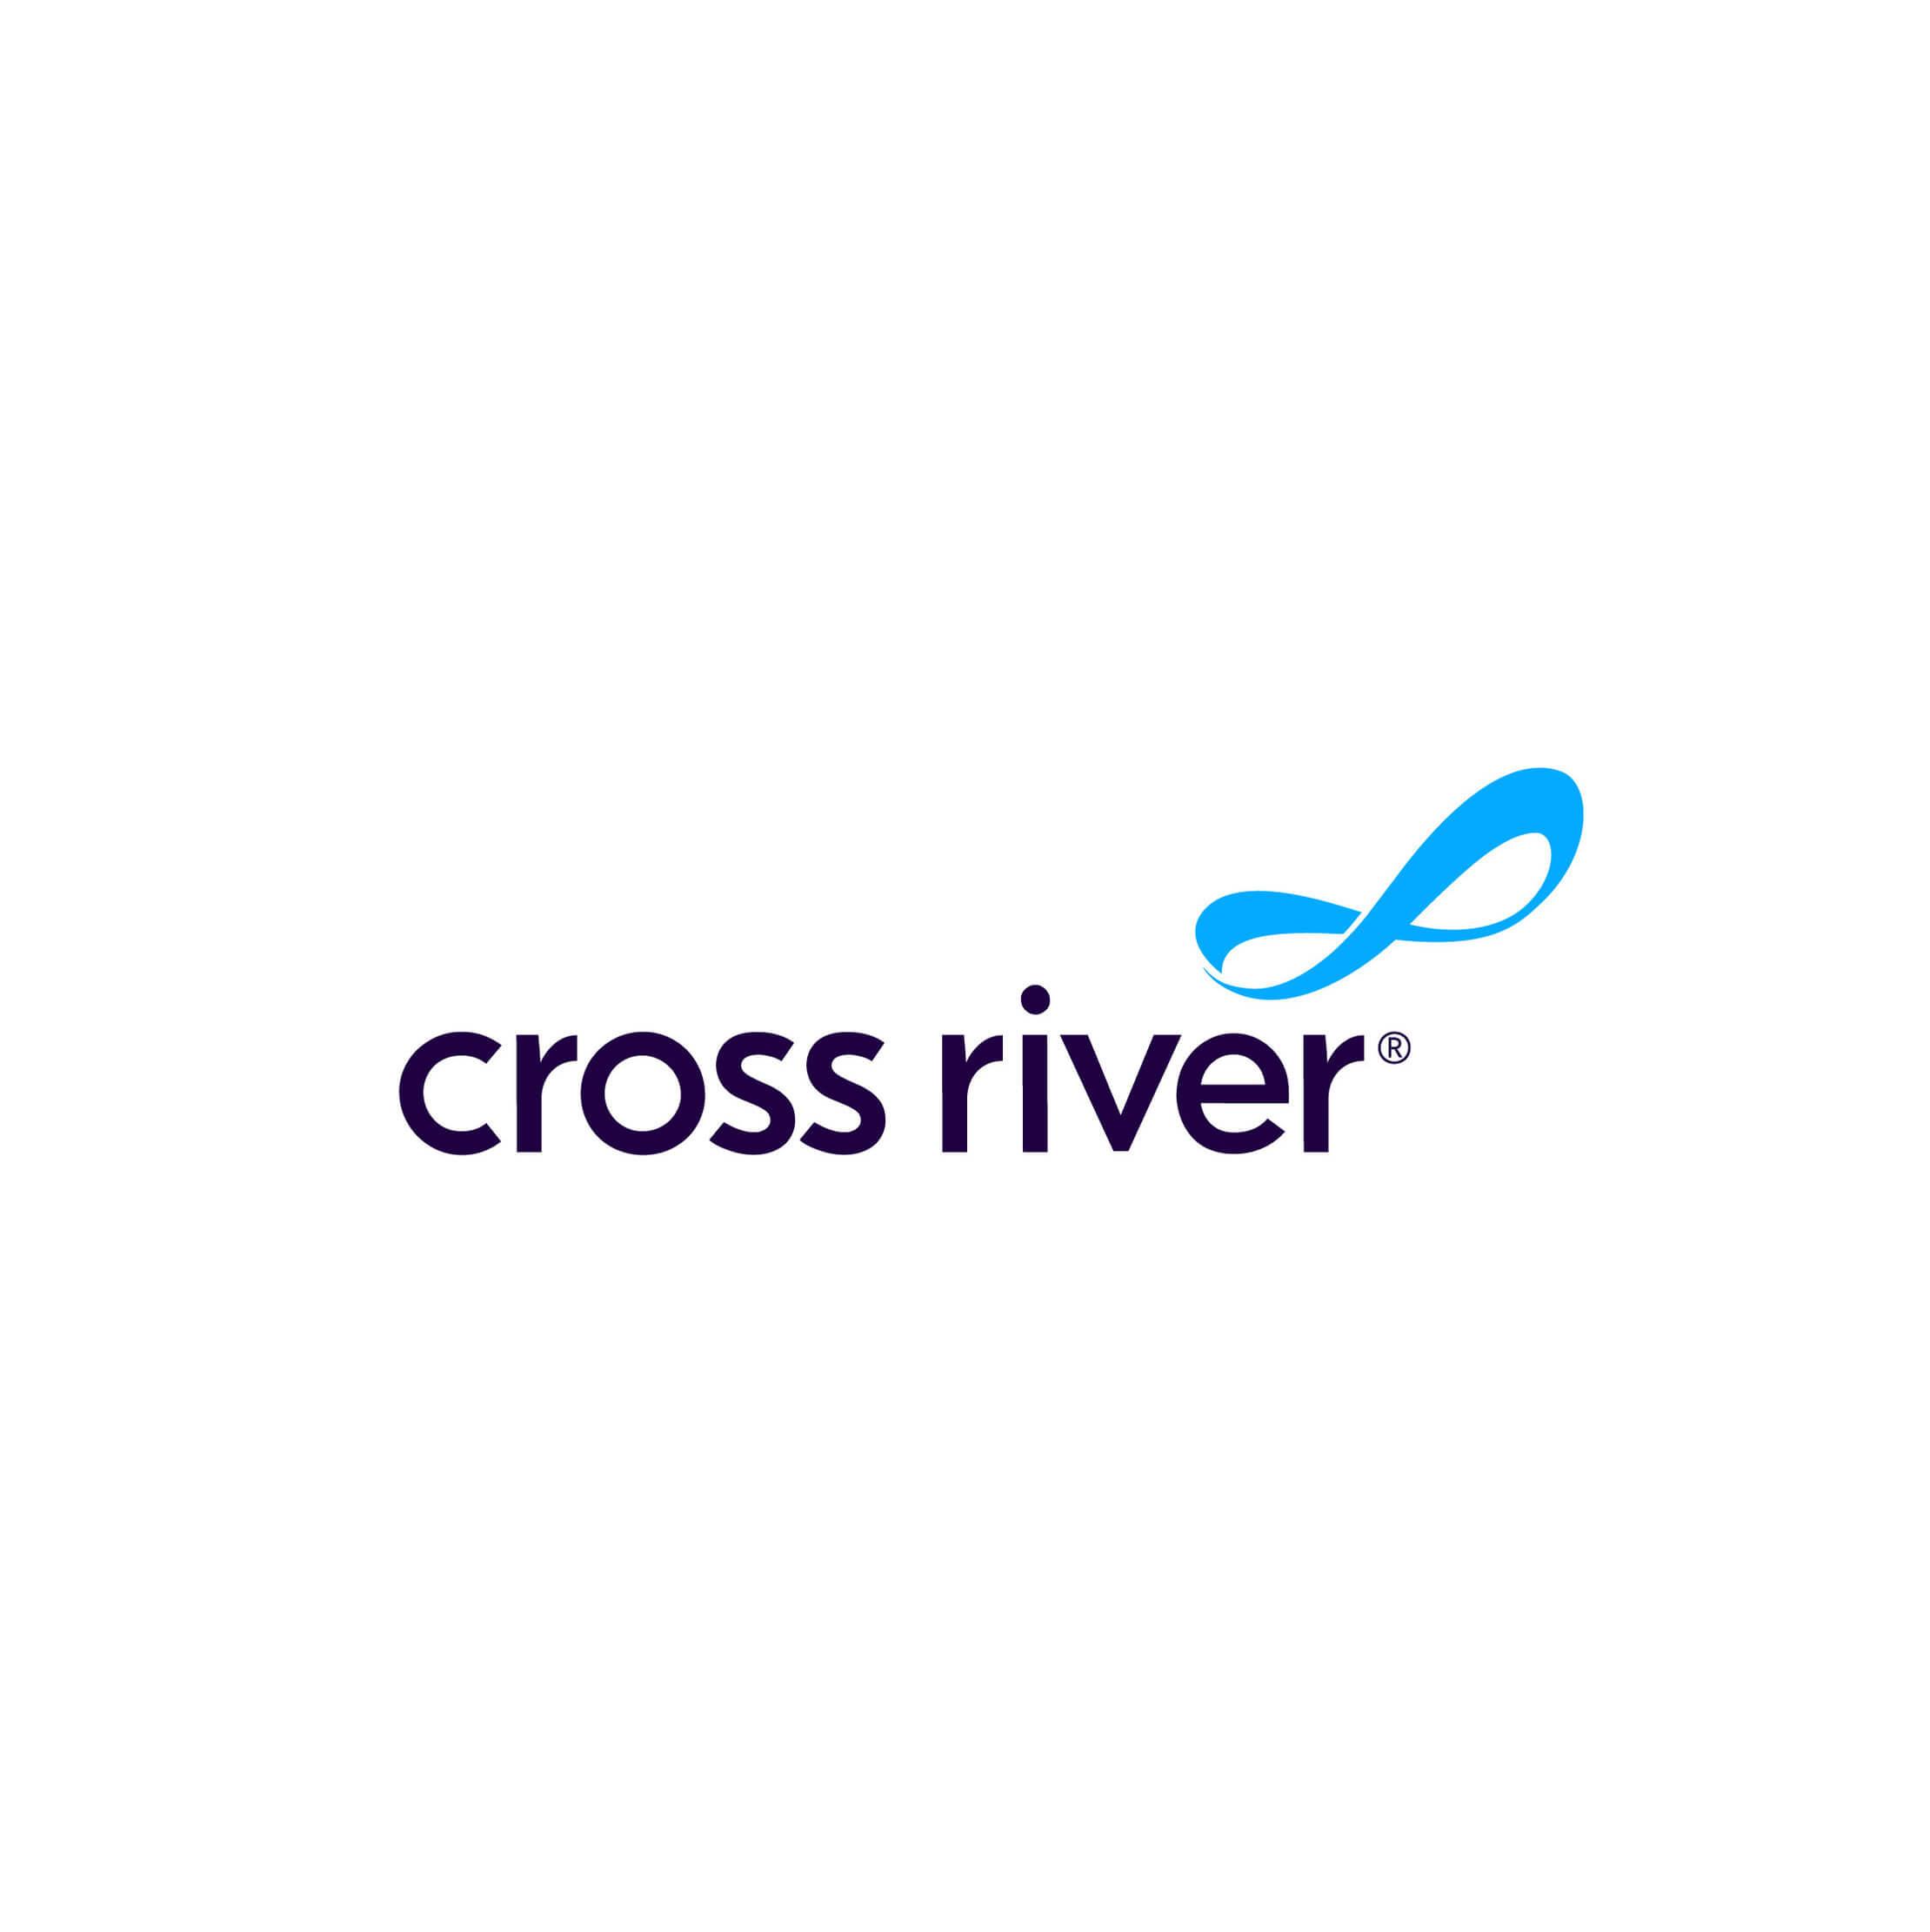 Cross River Bank XRP